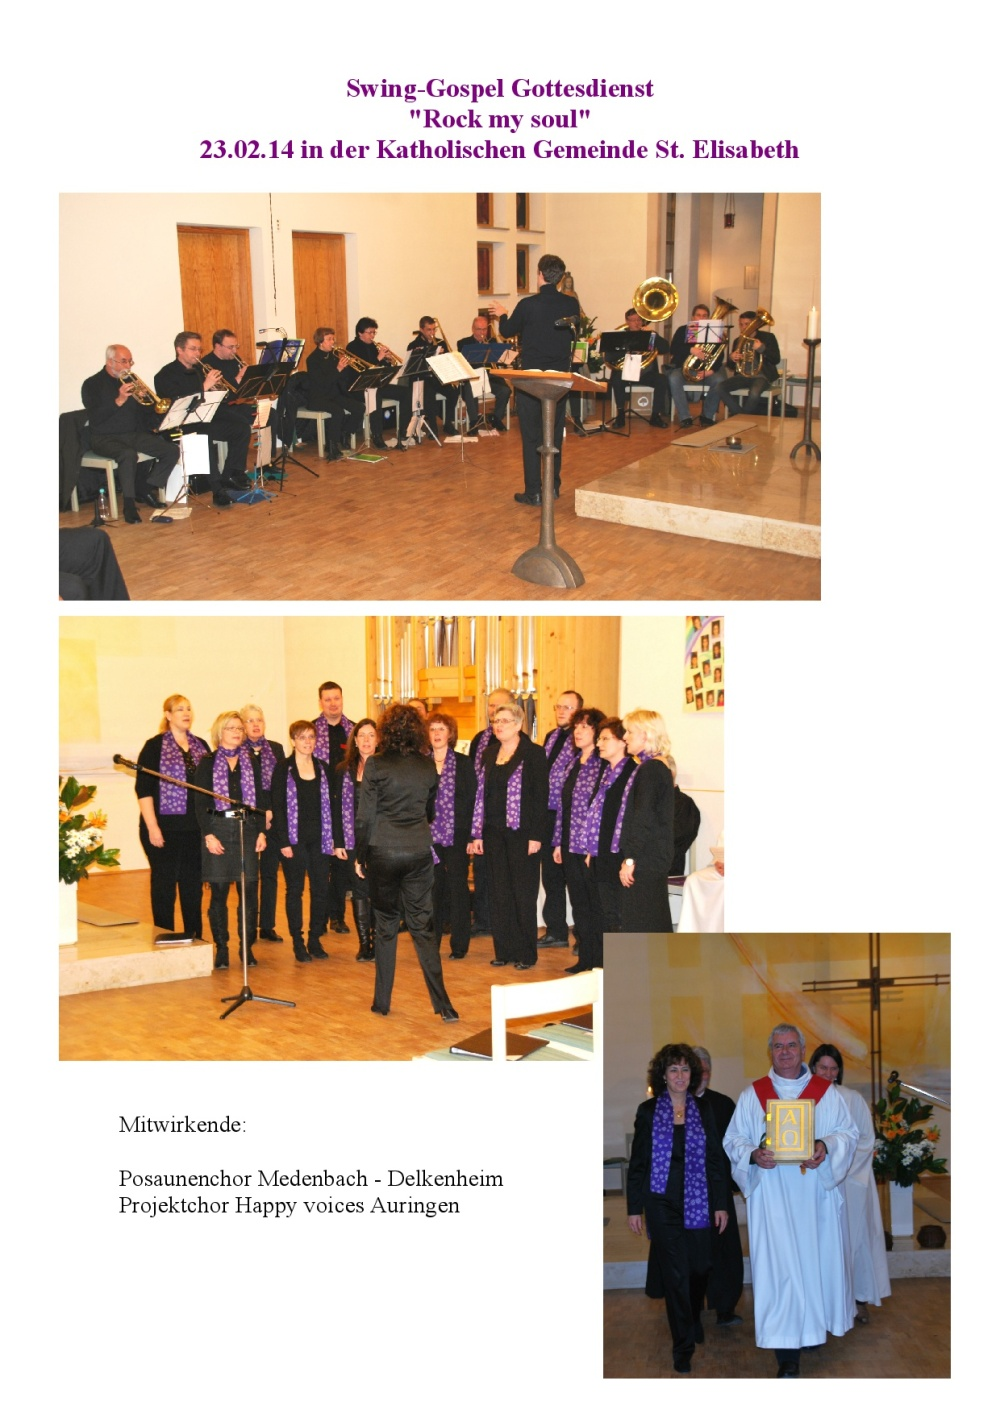 05-Swing-Gospel-Godi 23.02.14-001